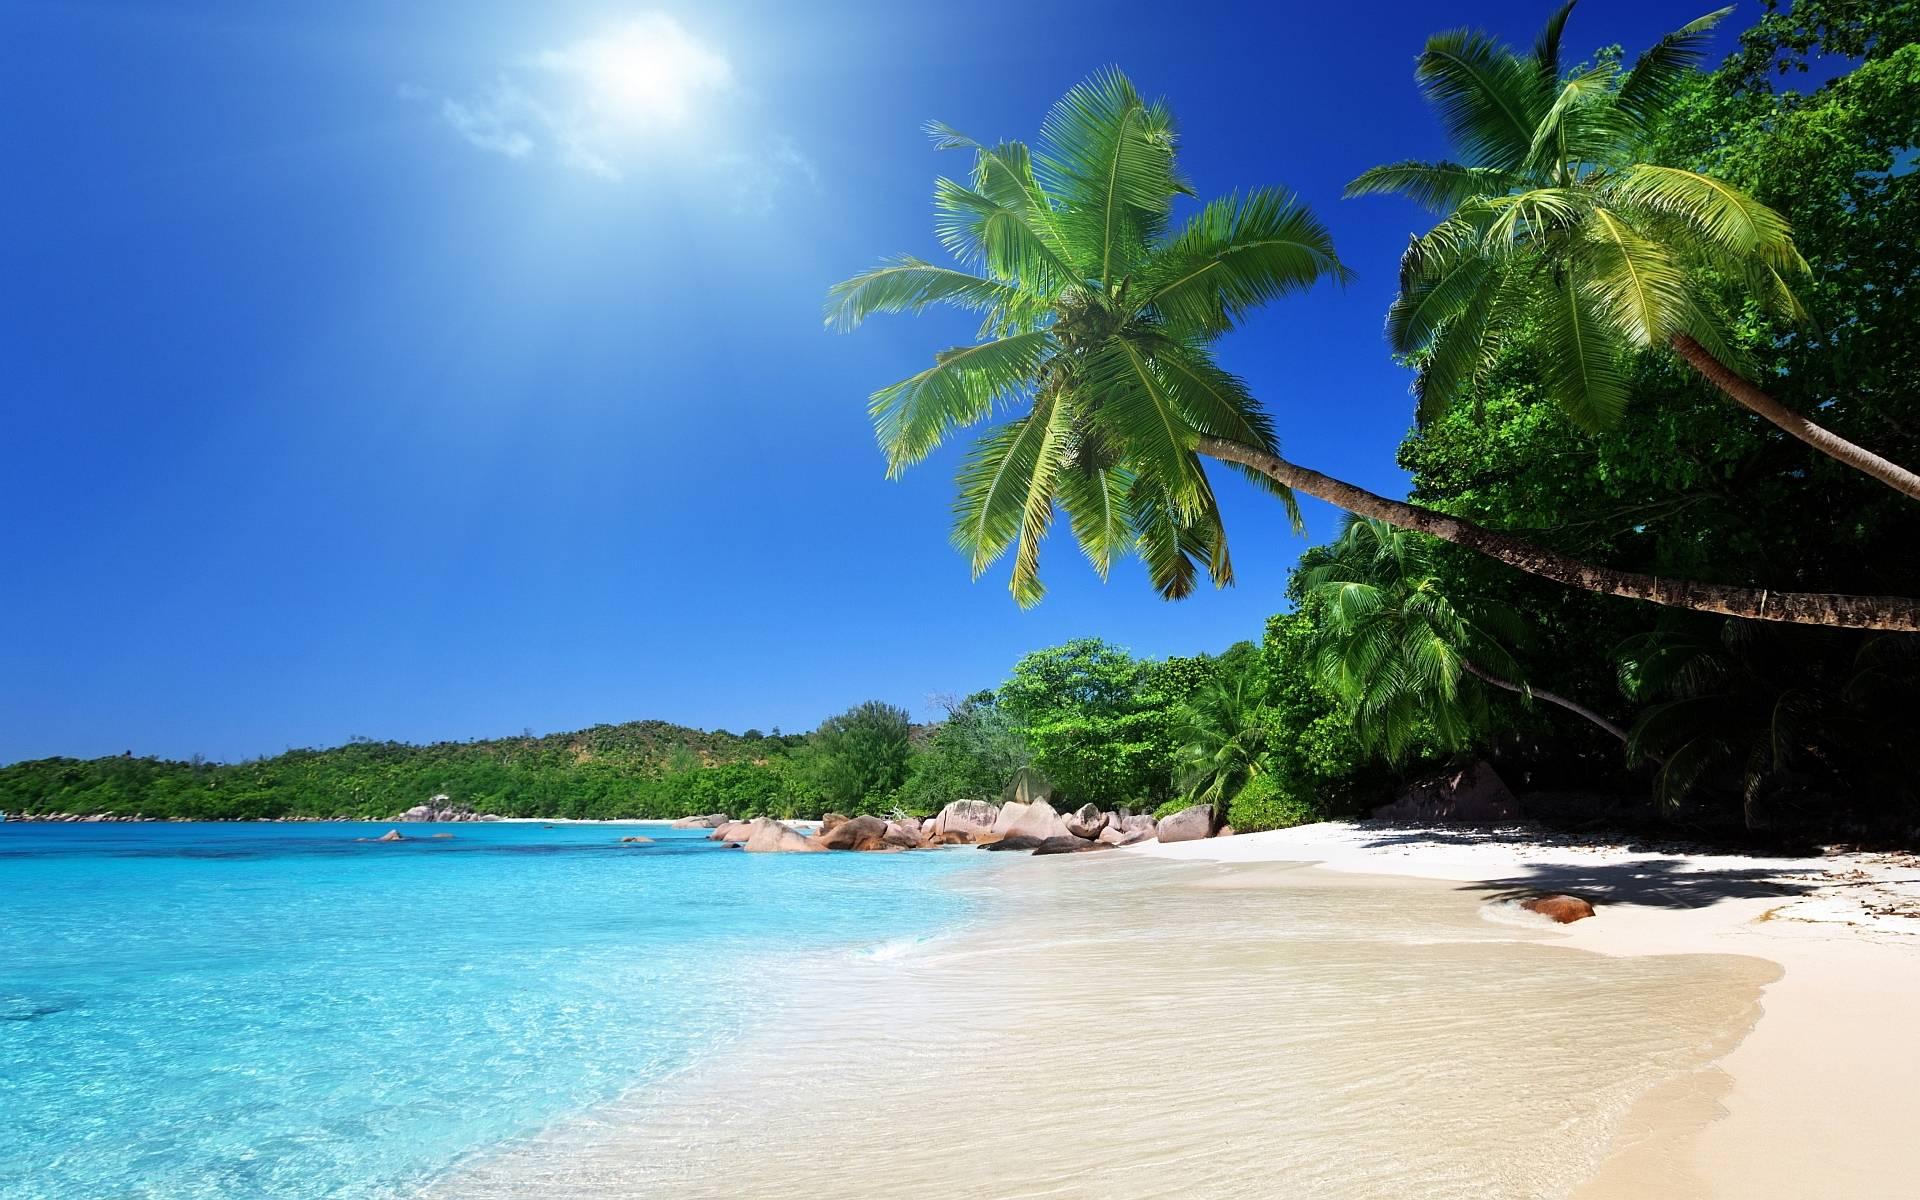 Beautiful Beach Backgrounds